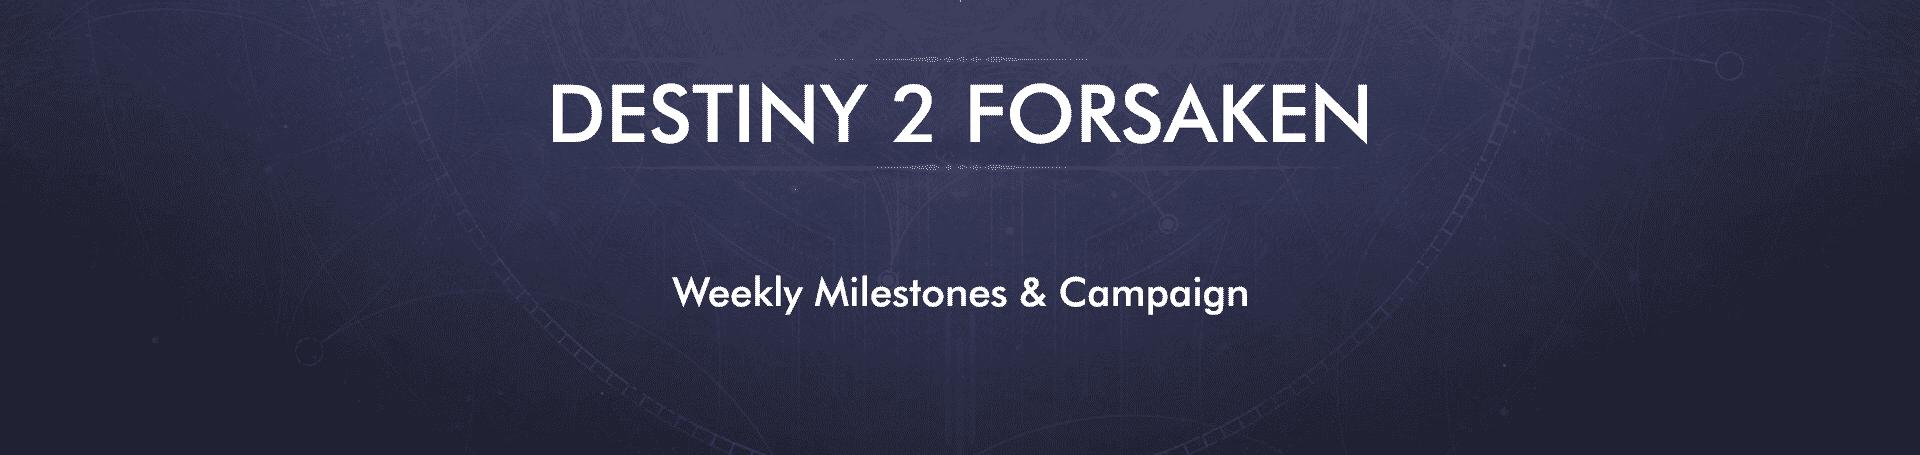 forsaken campaign and milestone service